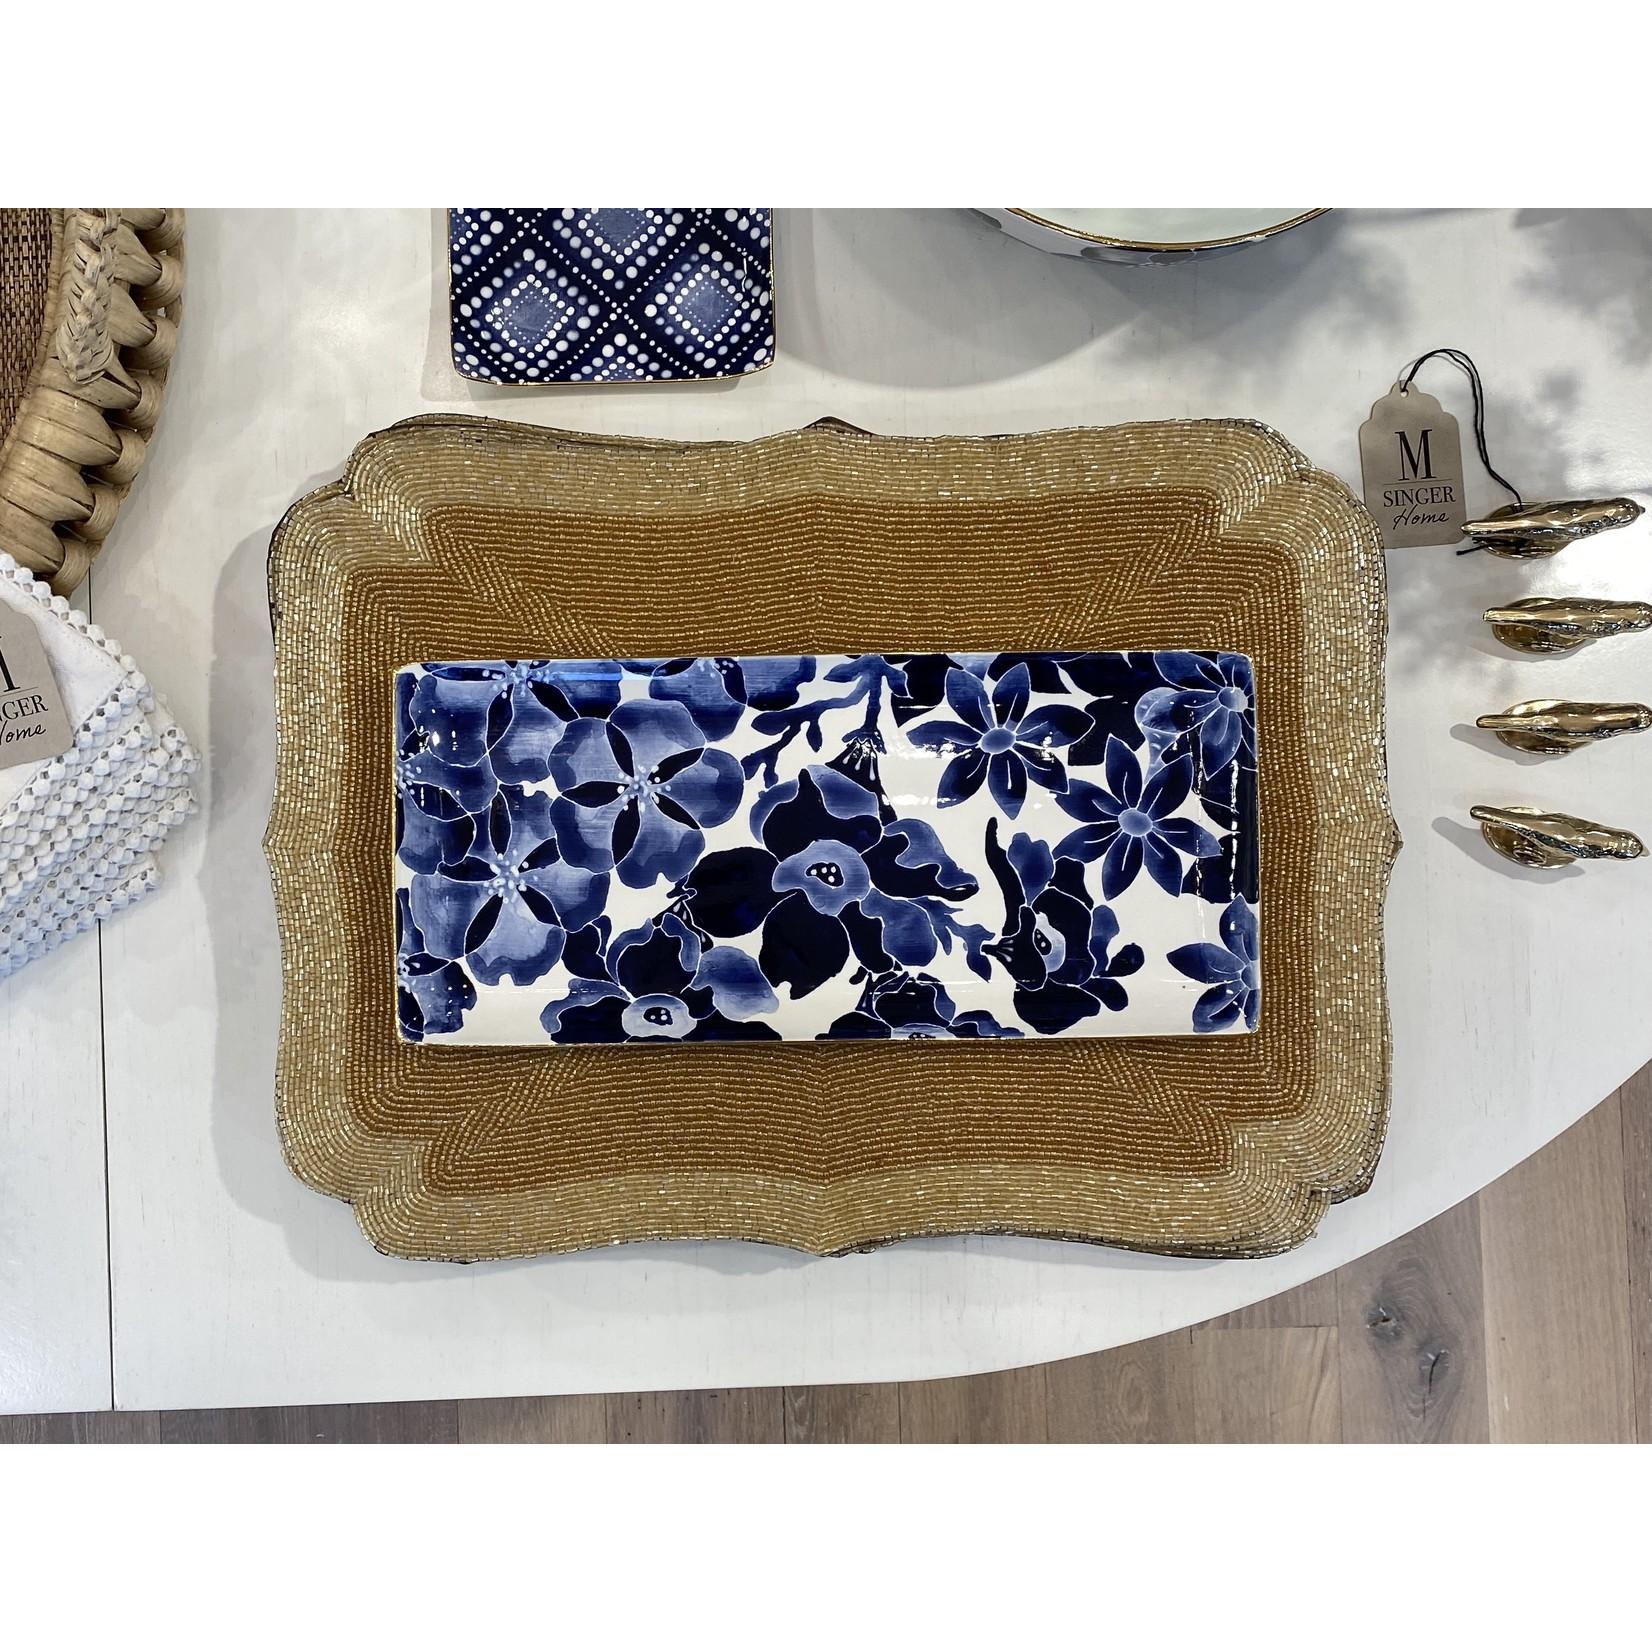 Jill Rosenwald Cocktail Tray - Pripet/Delft